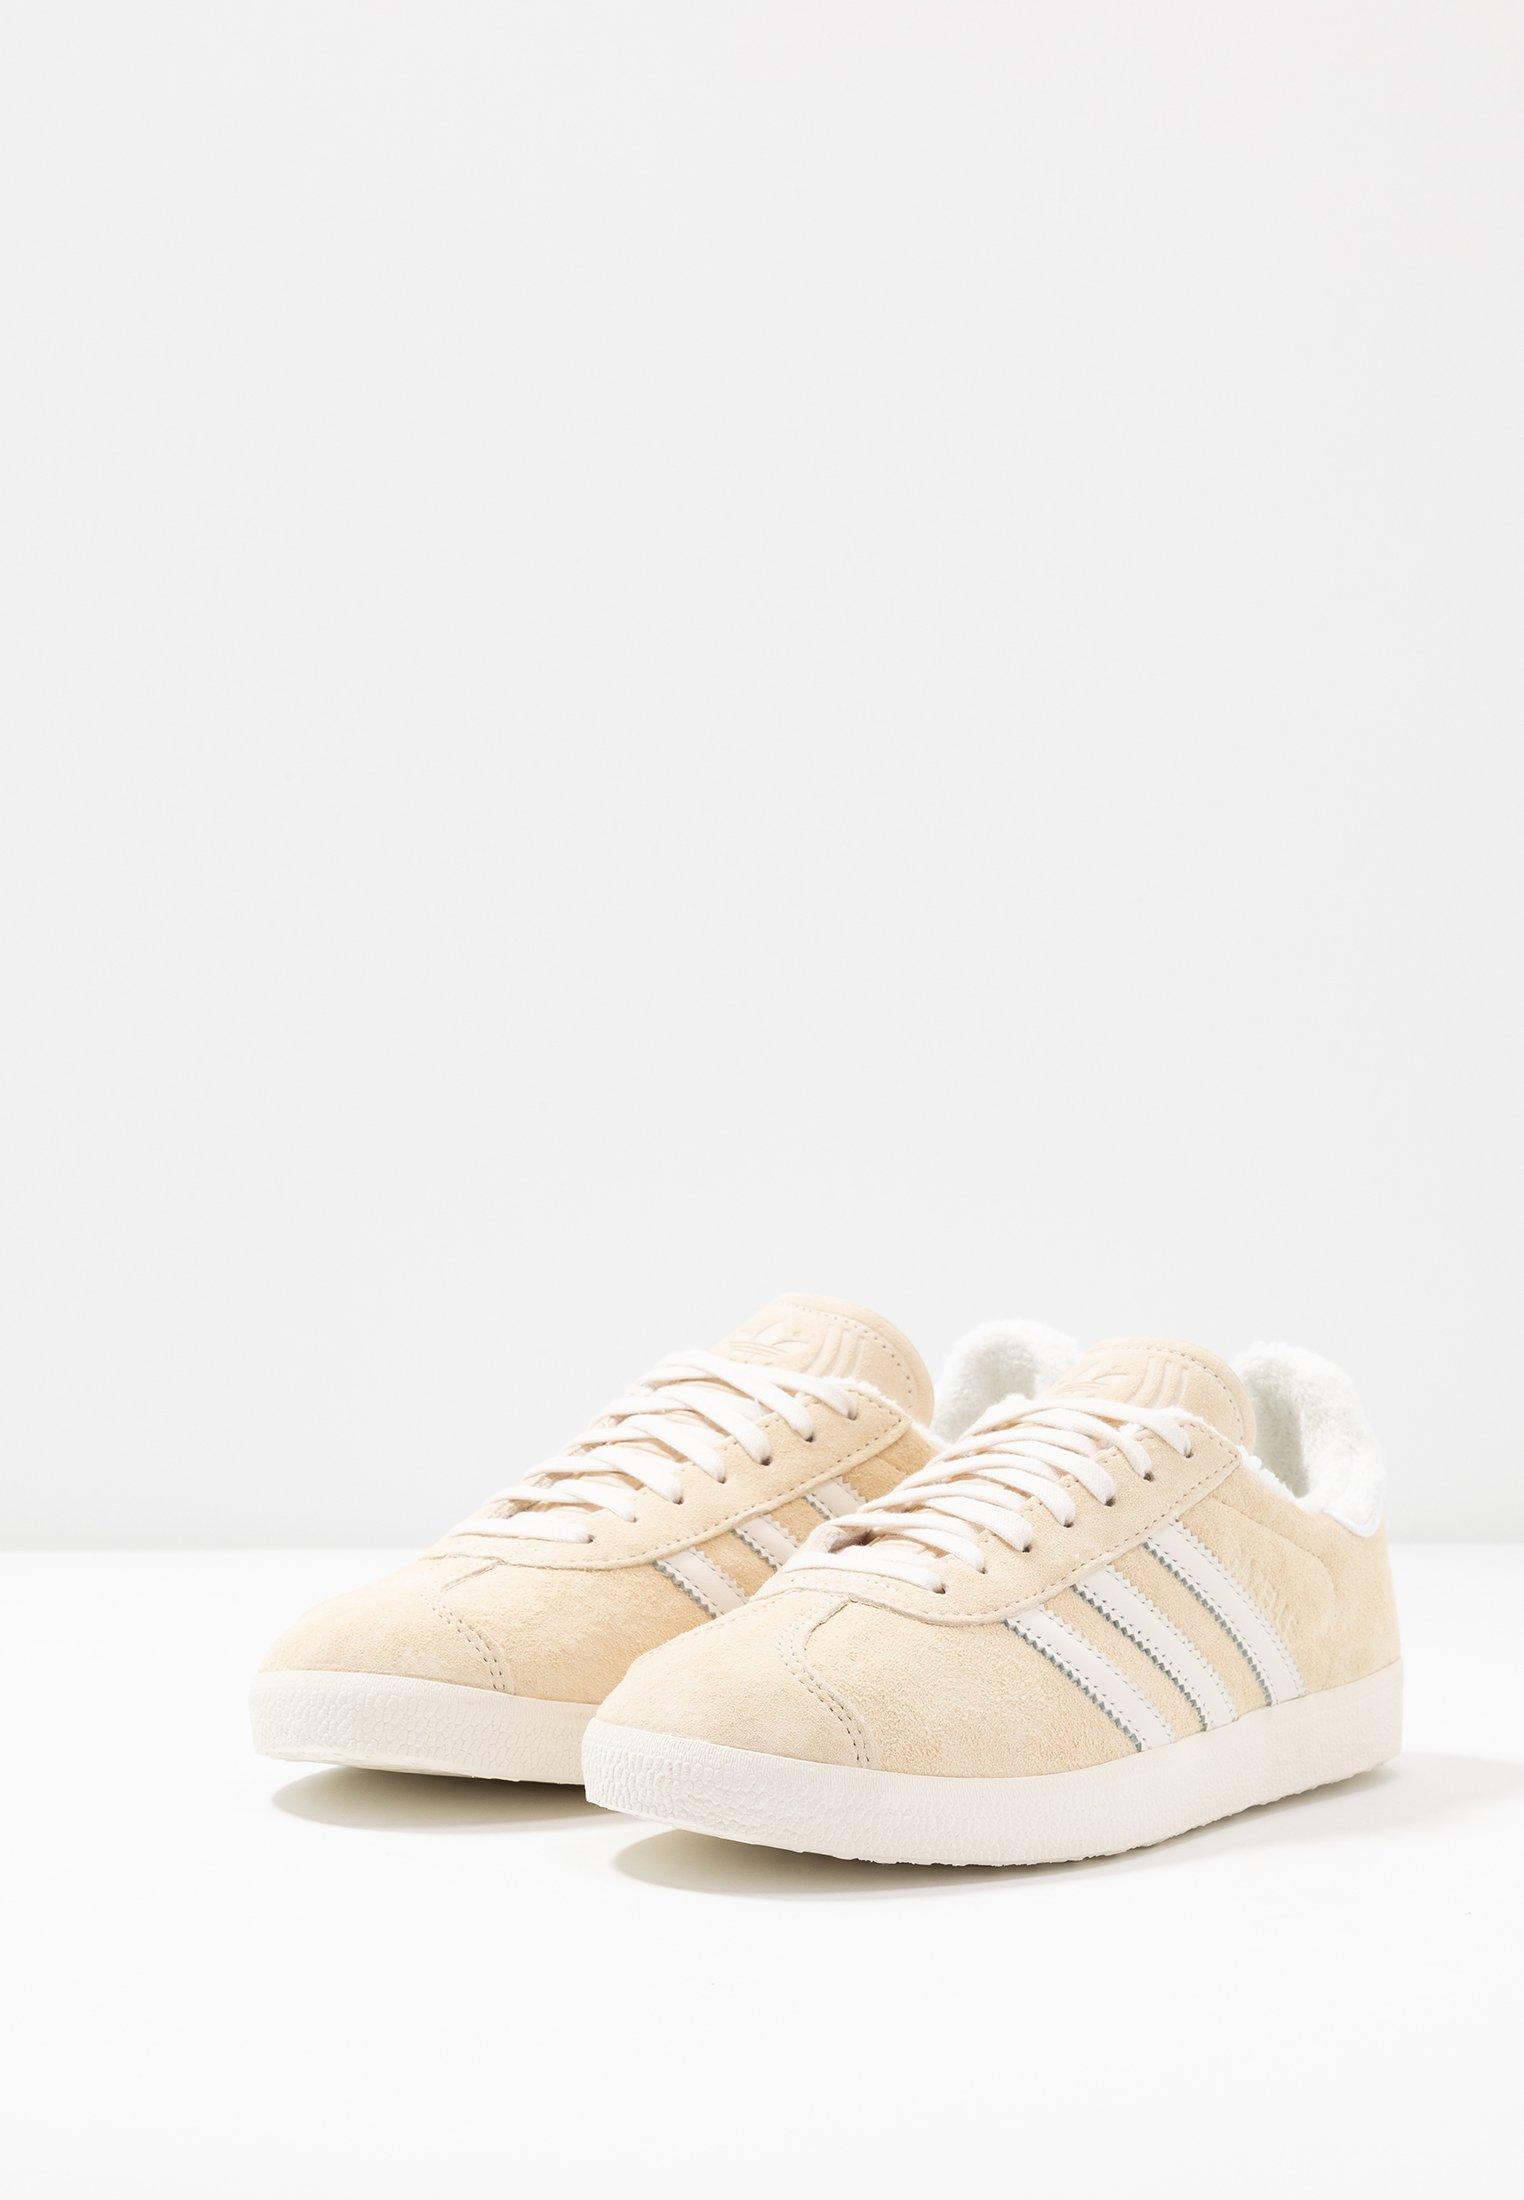 white footwear GAZELLEBaskets core basses adidas ecru tint white Originals c5LjA3R4q